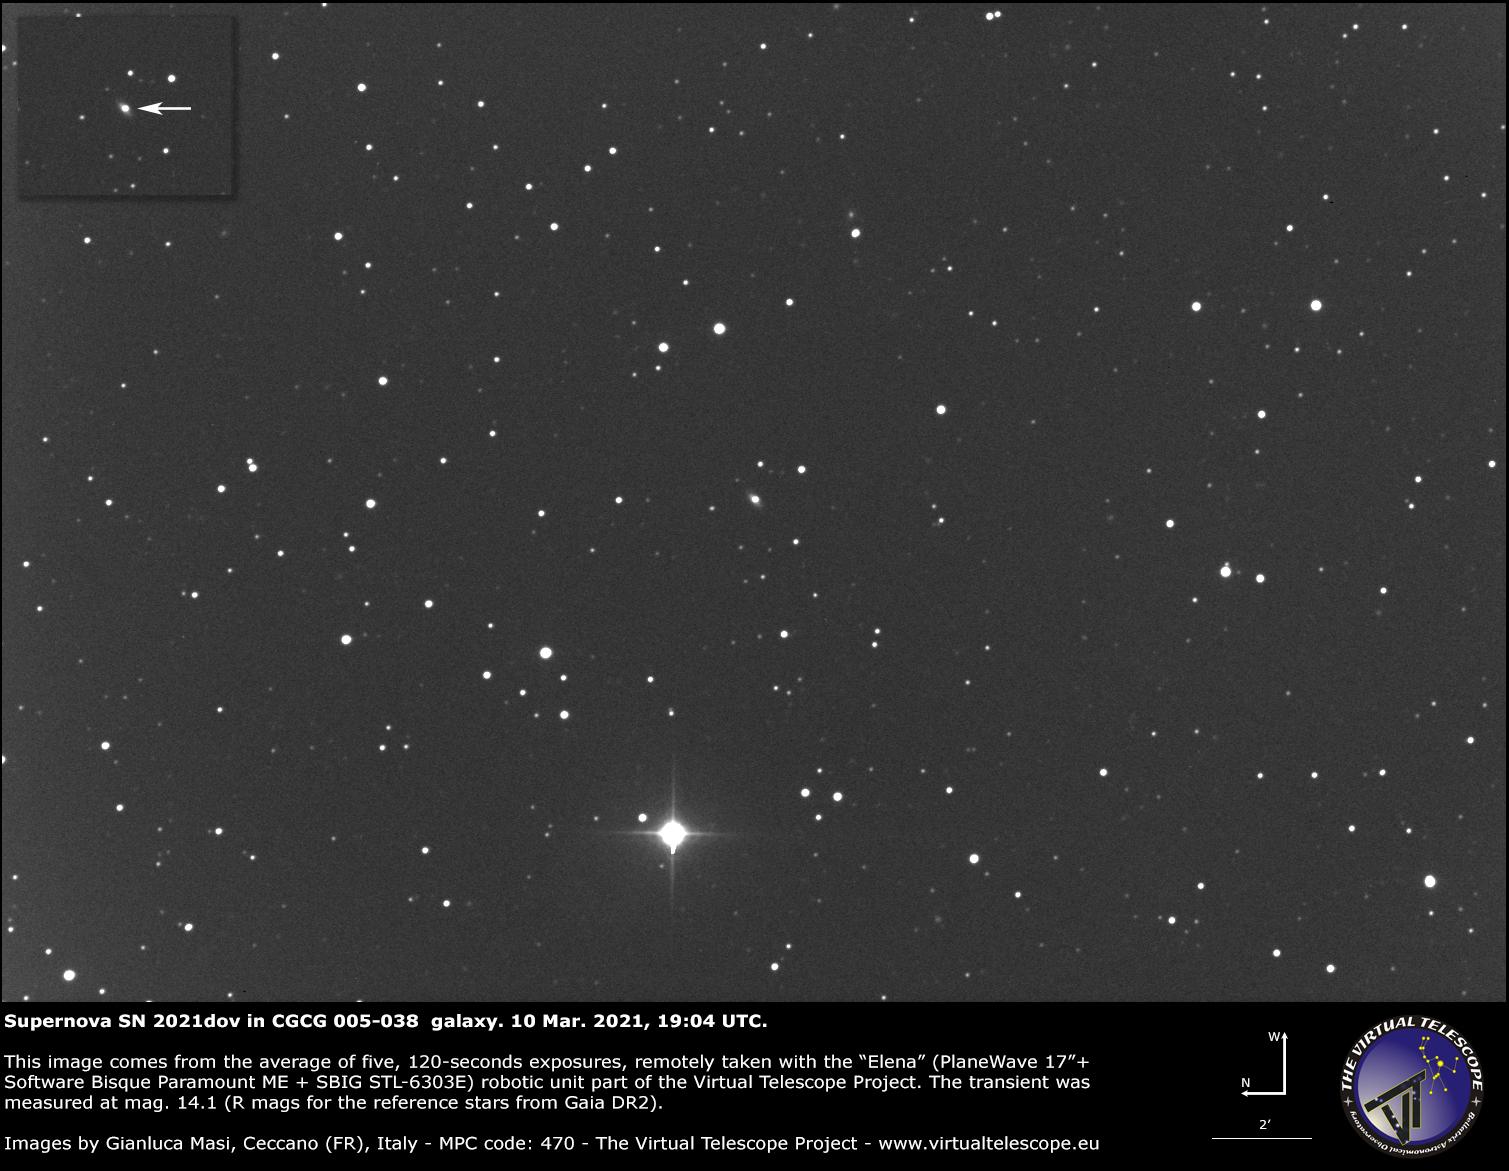 Supernova 2021dov in CGCG 005-038 galaxy: 10 Mar. 2021.